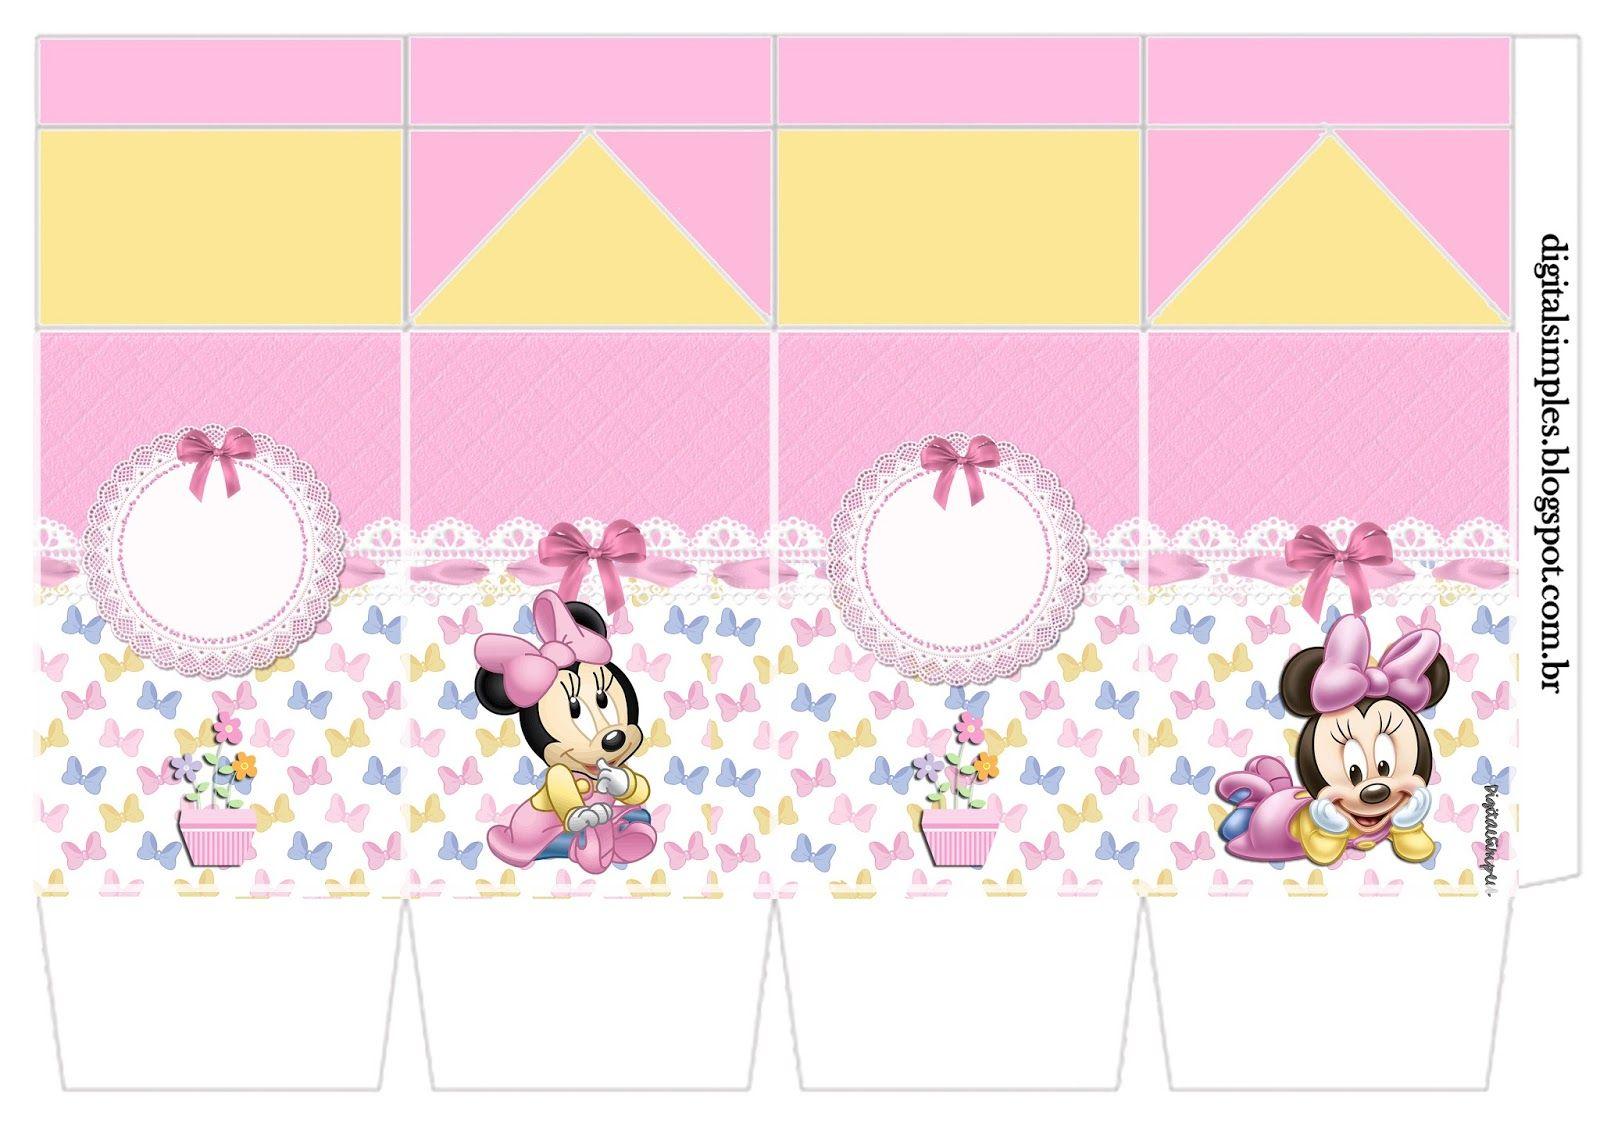 Kit De Personalizados Minnie Mouse Baby Para Imprimir Convites